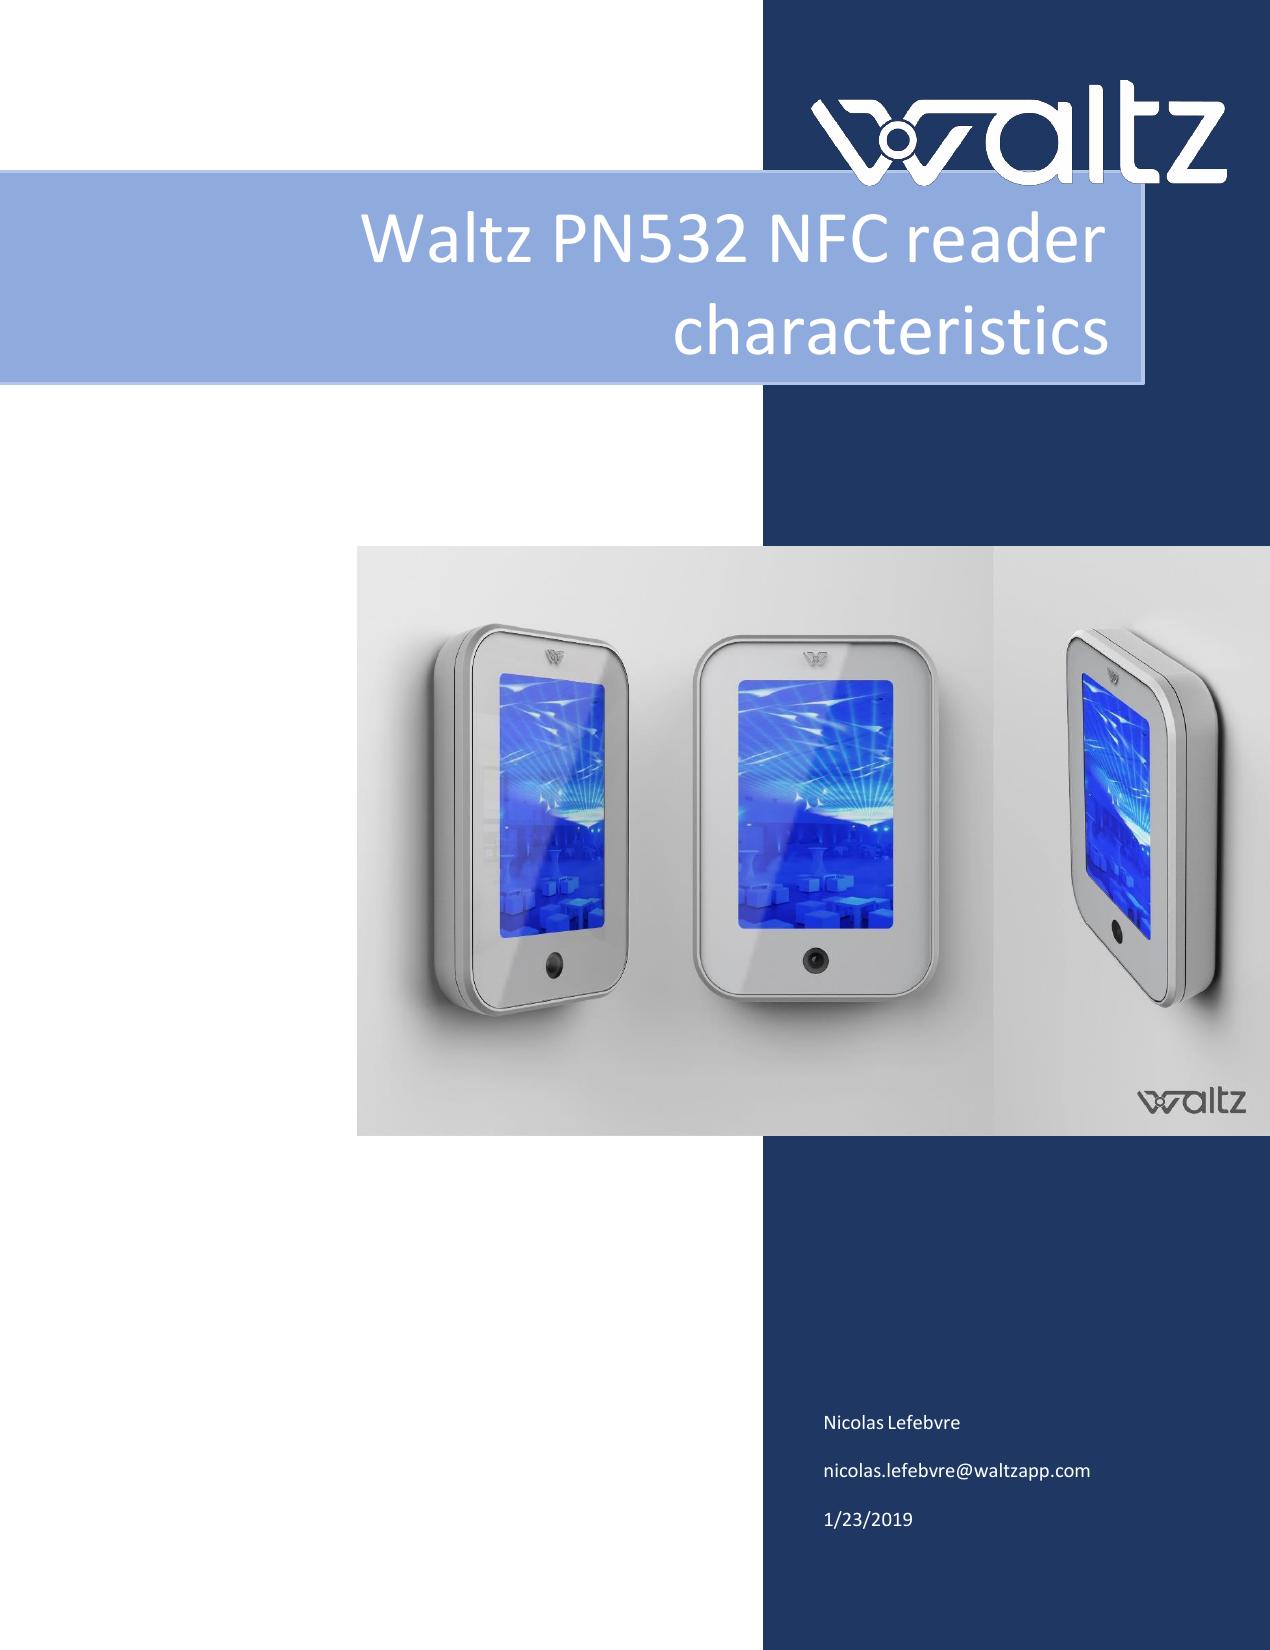 Waltz NFCPN532 Waltz NFC reader User Manual Waltz PN532 NFC reader